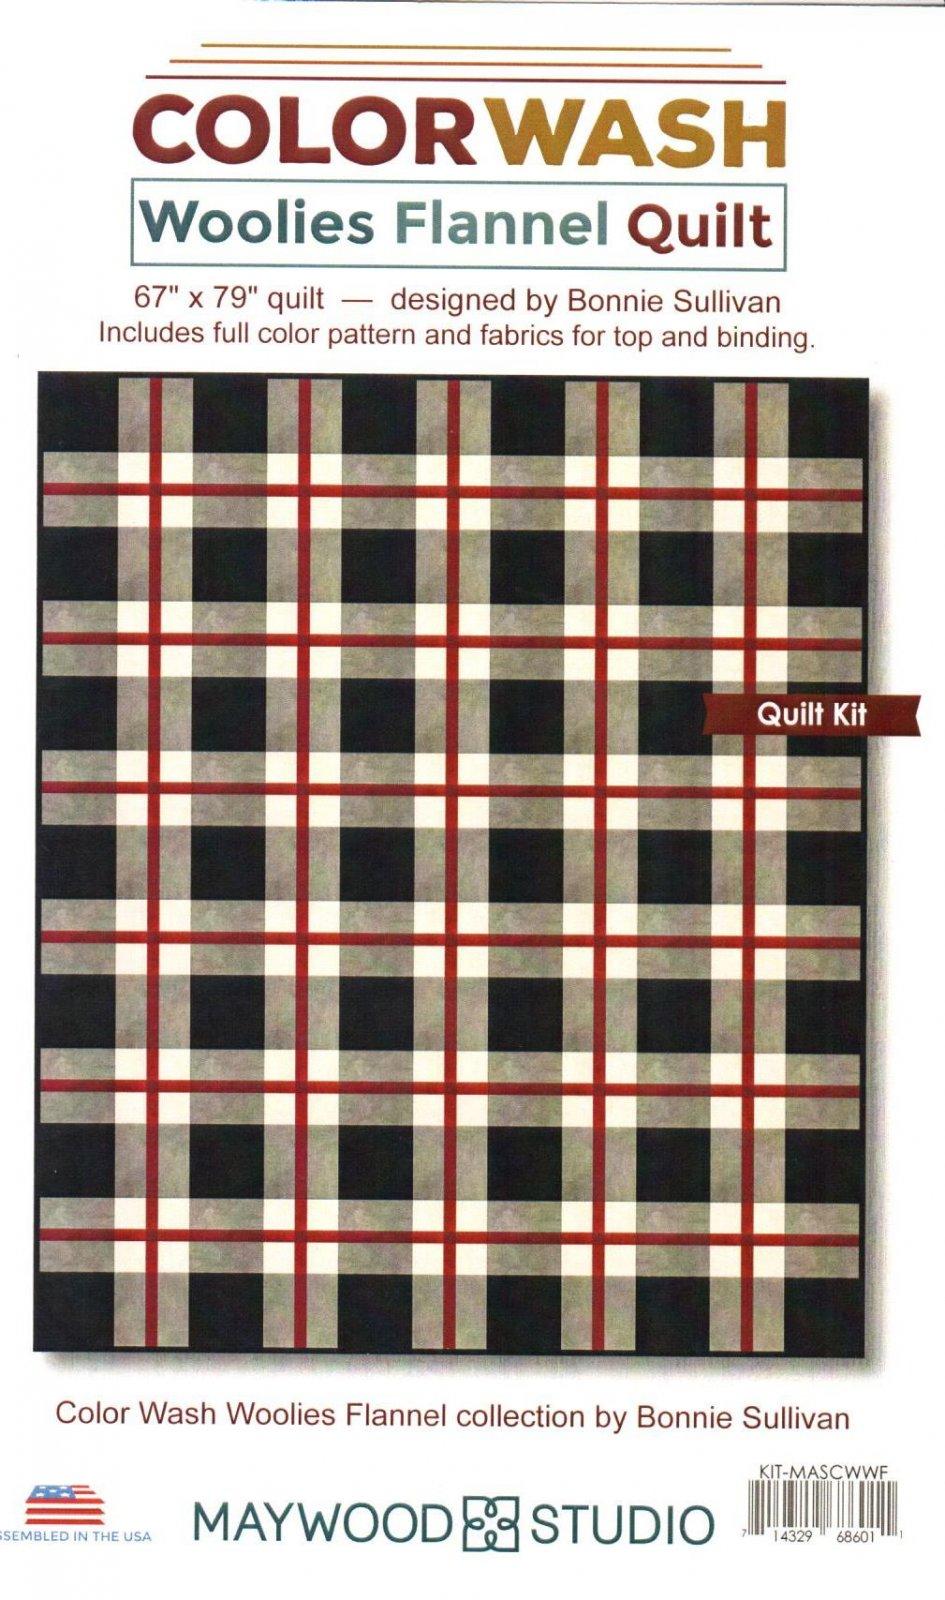 Colorwash - Woolies Flannel Quilt